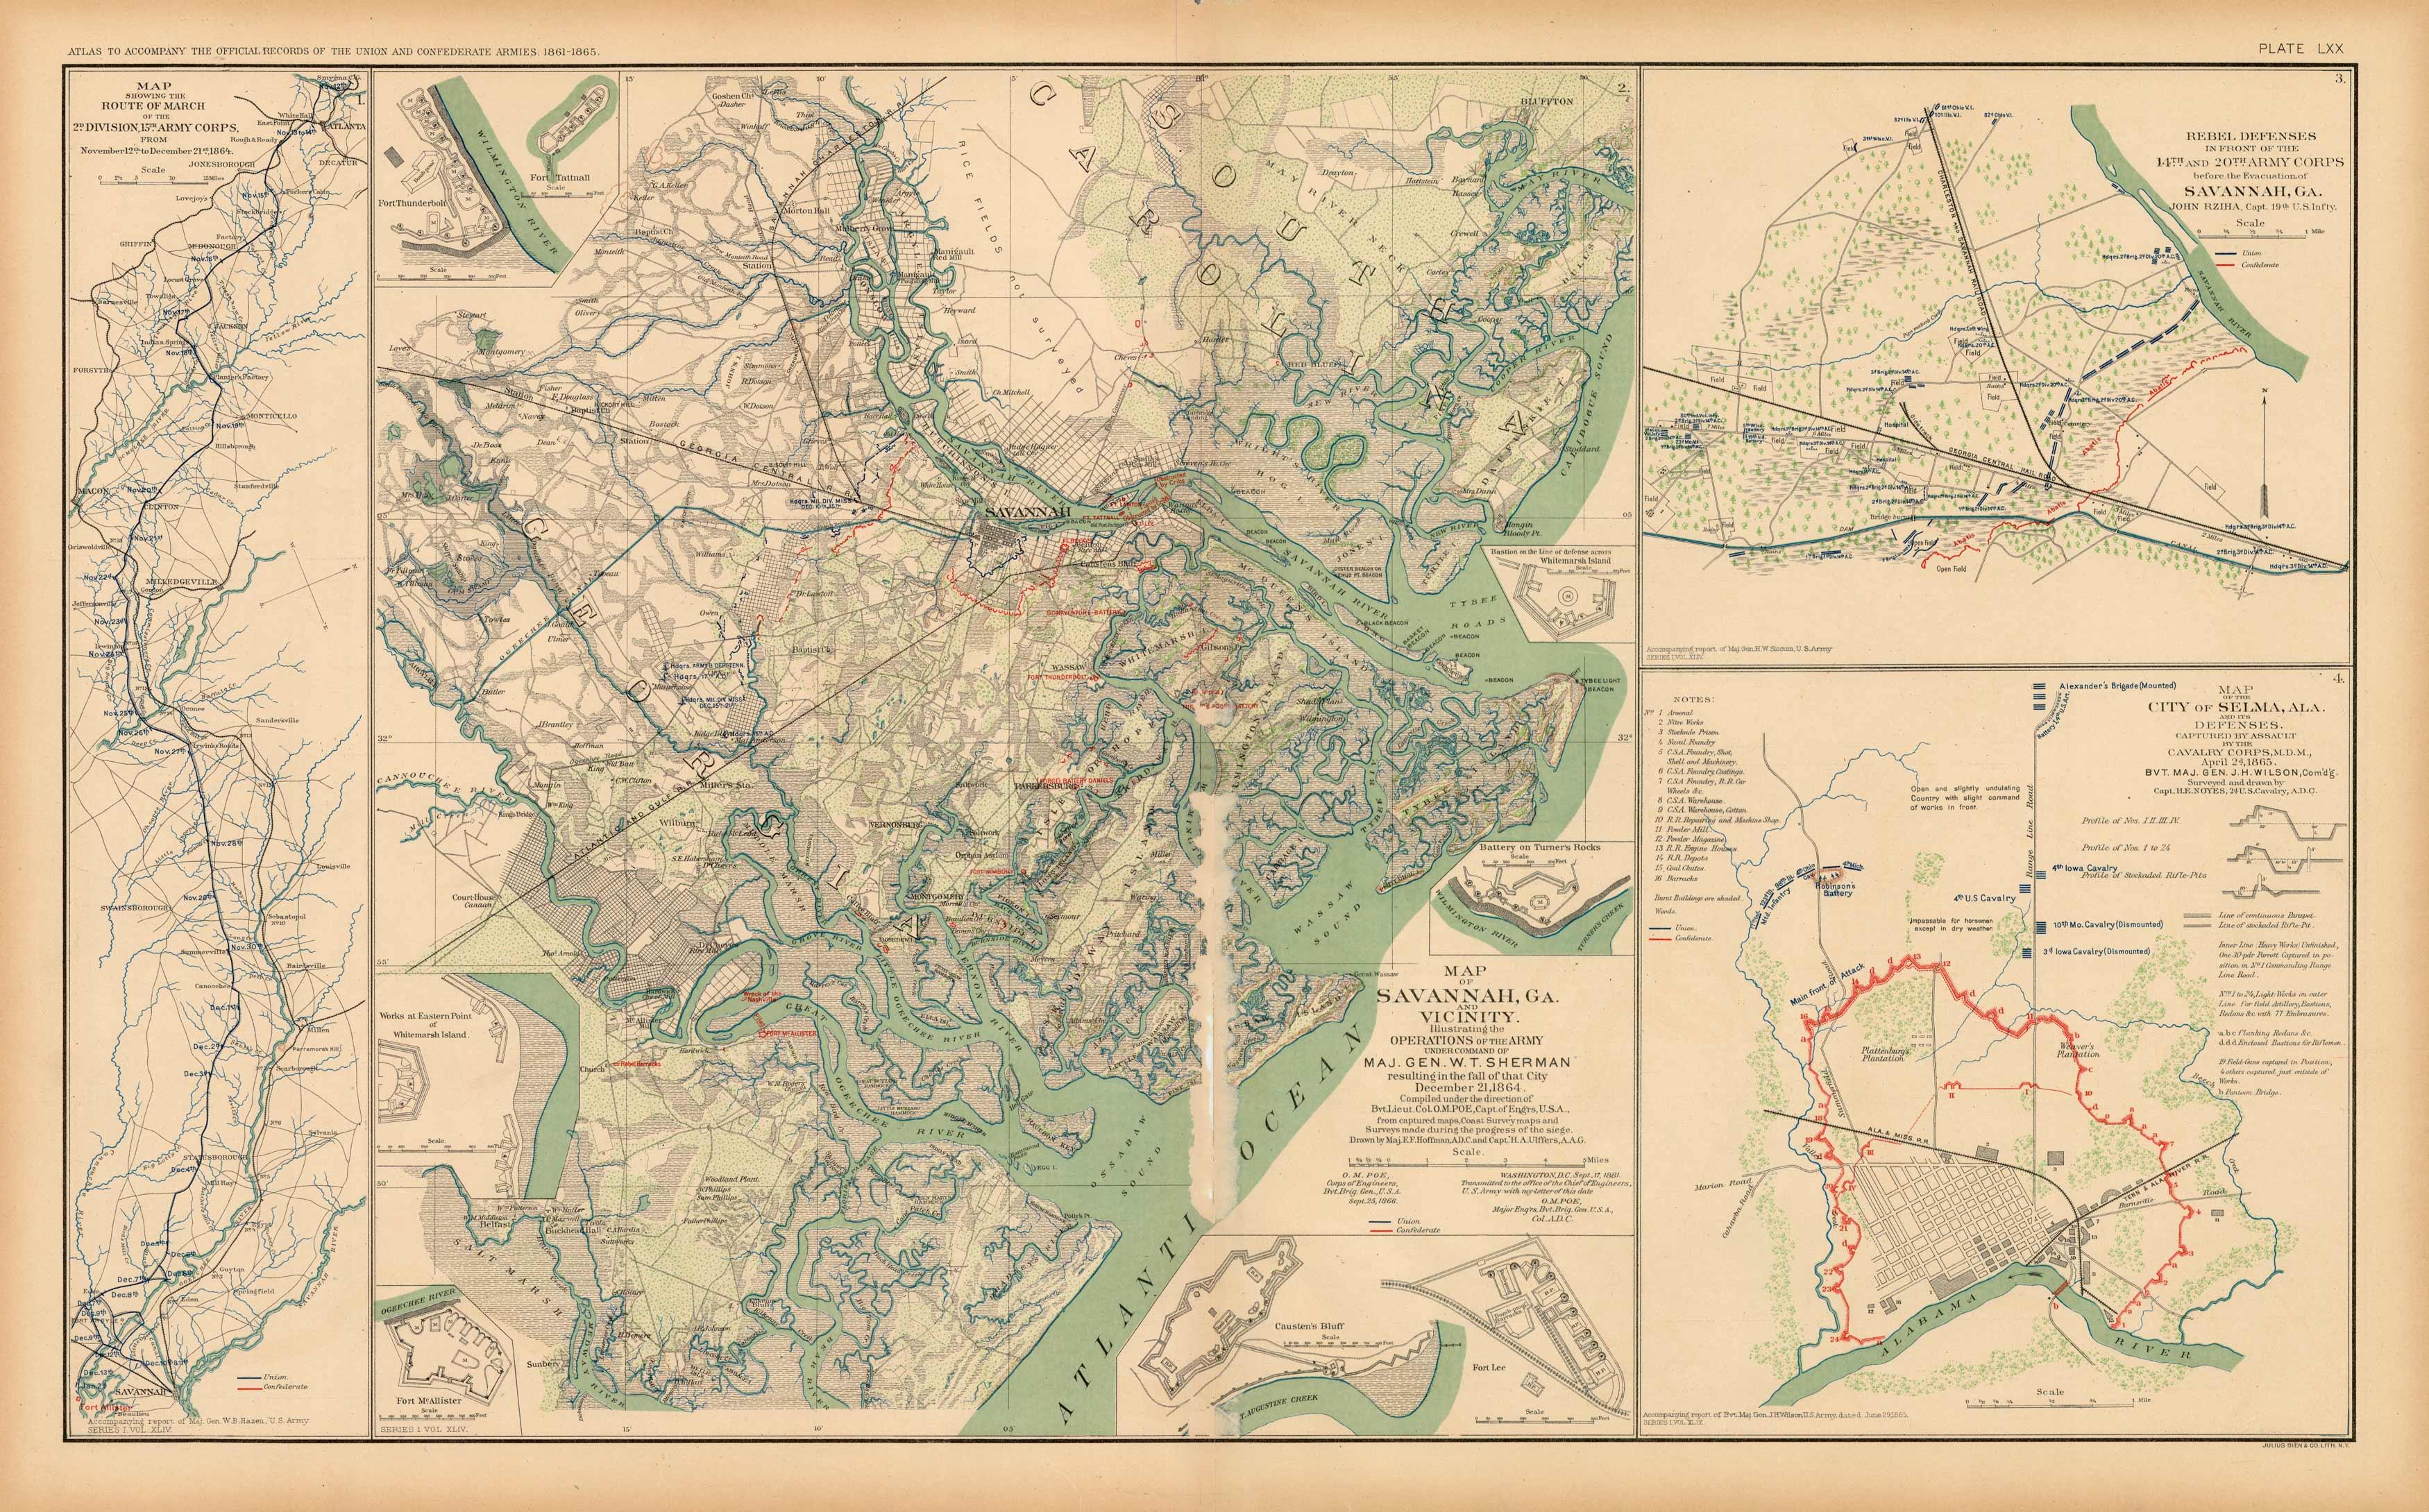 Map Of Georgia Plantations.Civil War Atlas Plate 70 Maps Of Savannah Georgia Selma Alabama